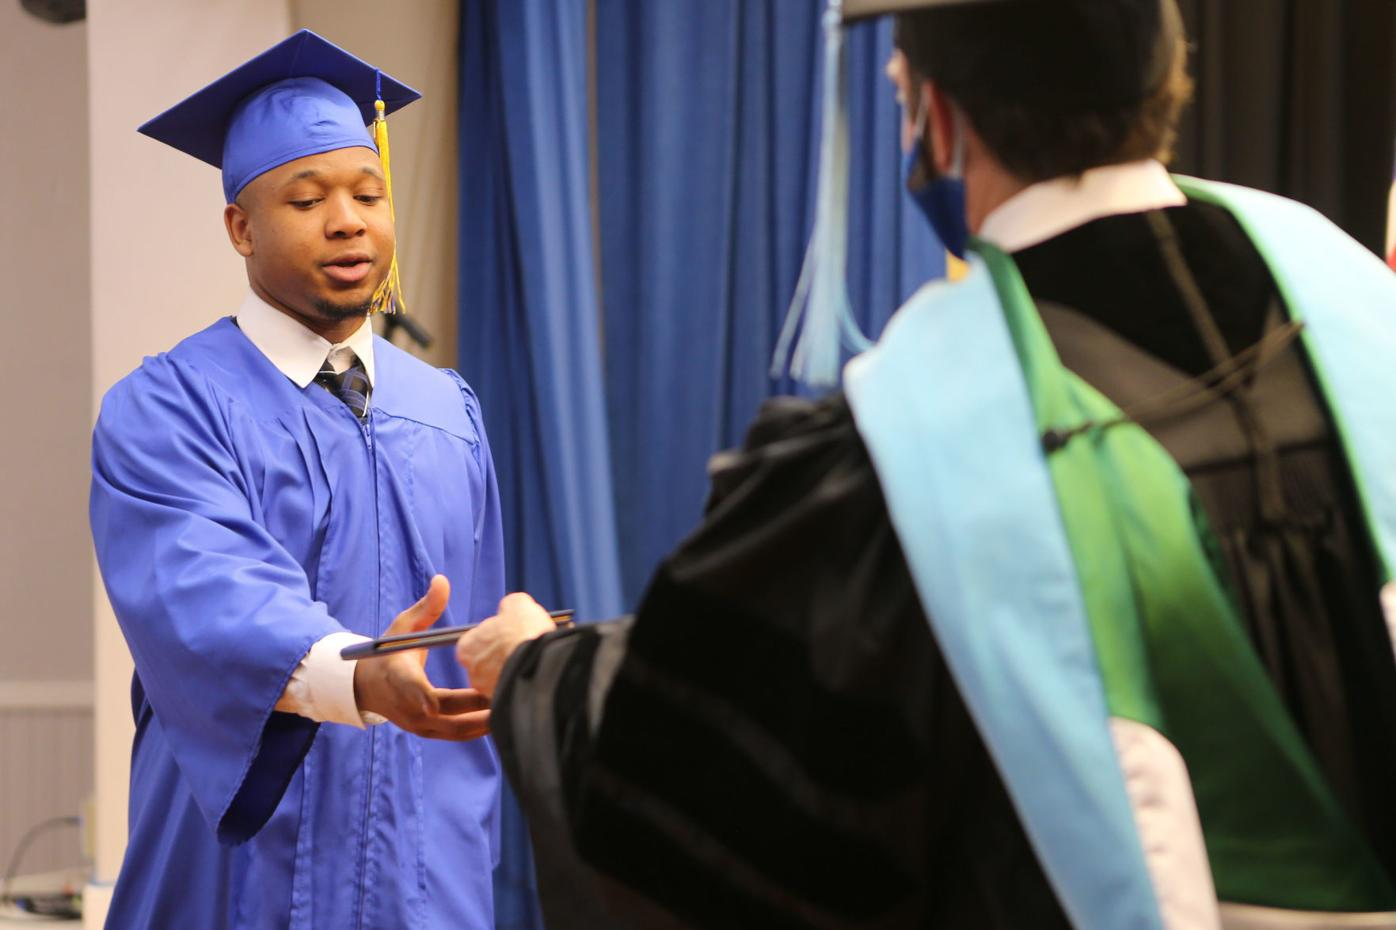 djr-2020-05-07-news-tupelo-graduation-lawhon-arp10